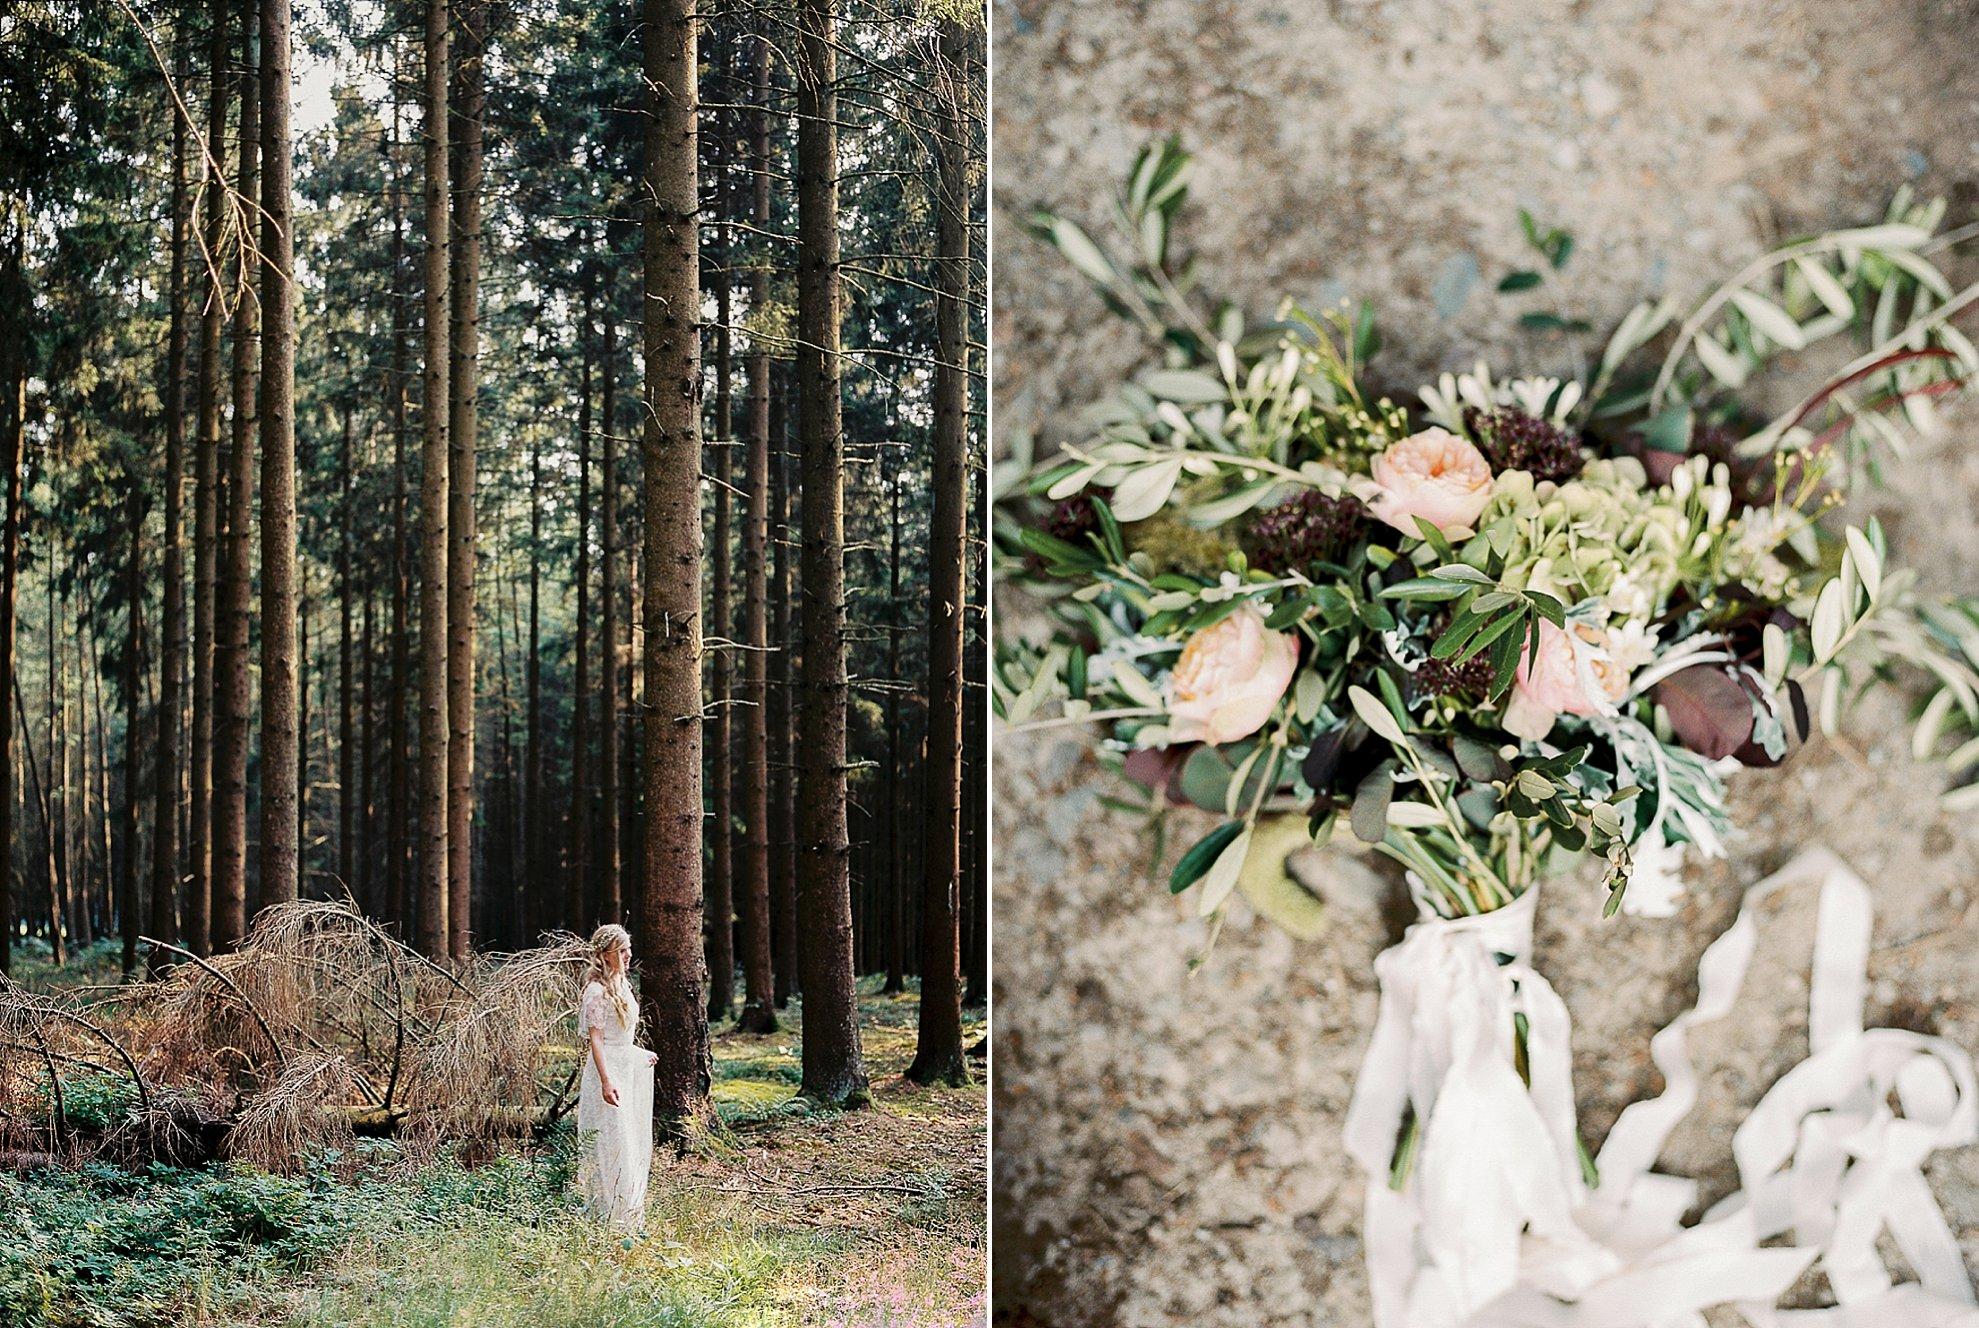 Amanda-Drost-Fotografie-Belgie-Photography-Wedding_0003.jpg